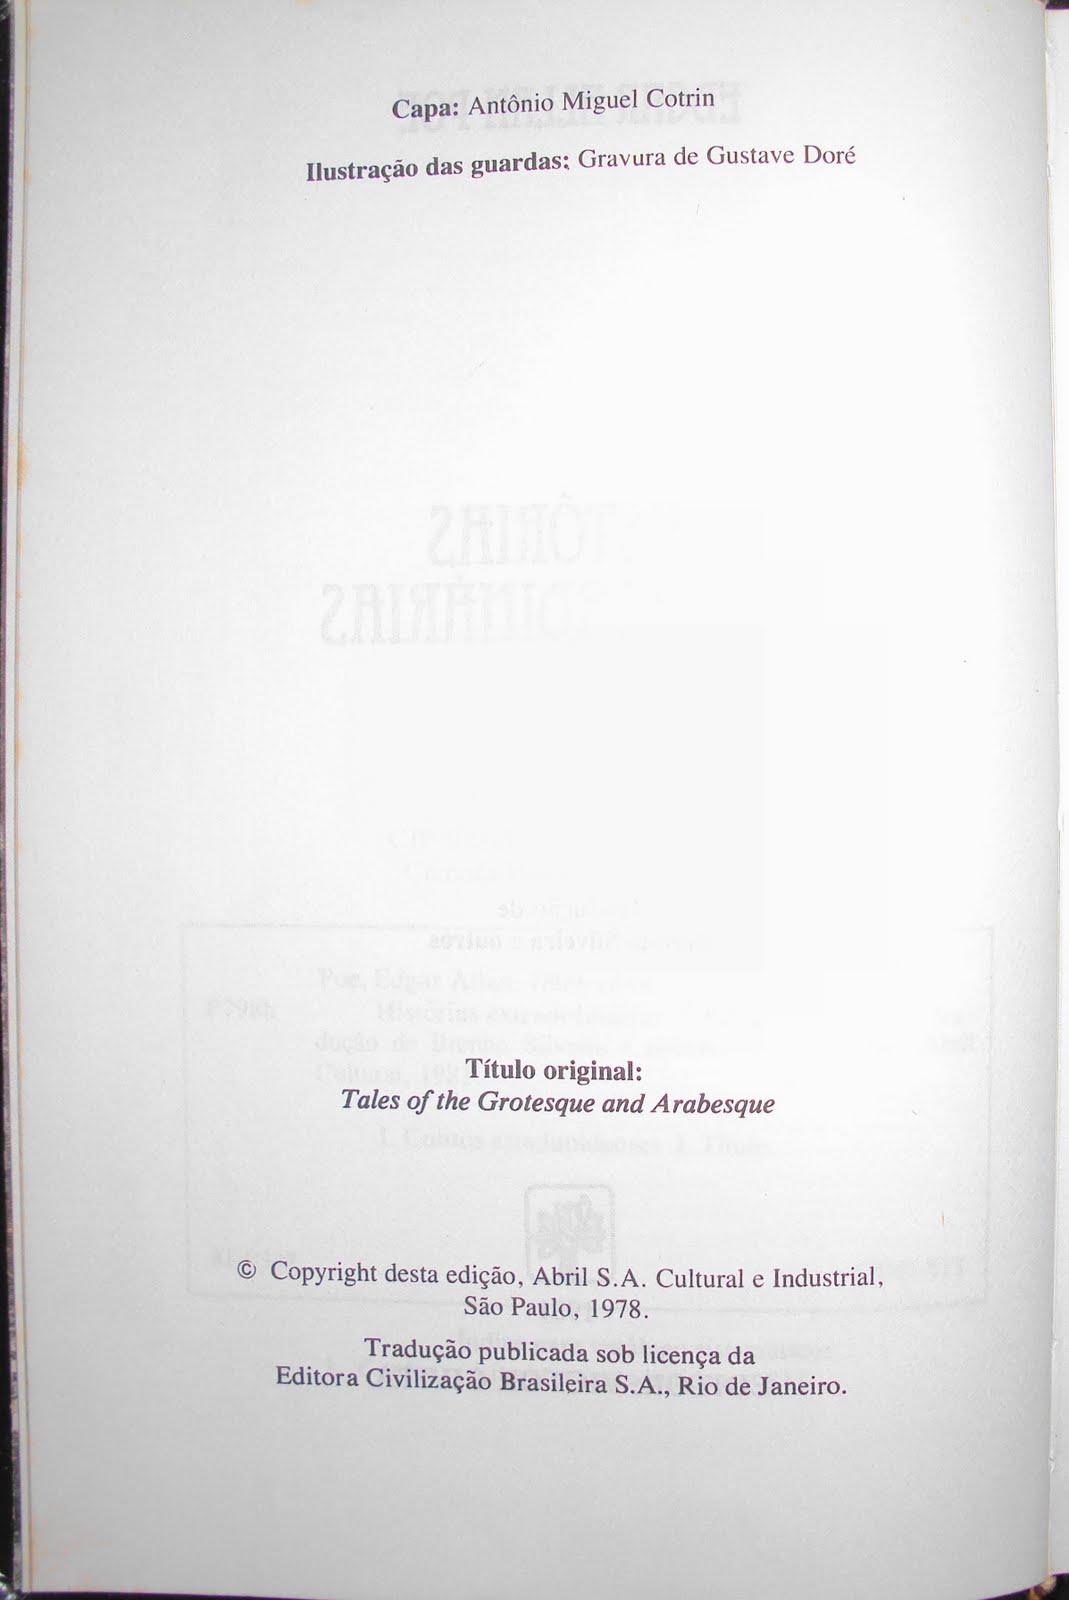 No gosto de plgio abril 2010 ora ocorre que a traduo publicada pela bestbolso agora em 2010 em nome de brenno silveira idntica traduo de berenice xavier na edio da abril fandeluxe Images